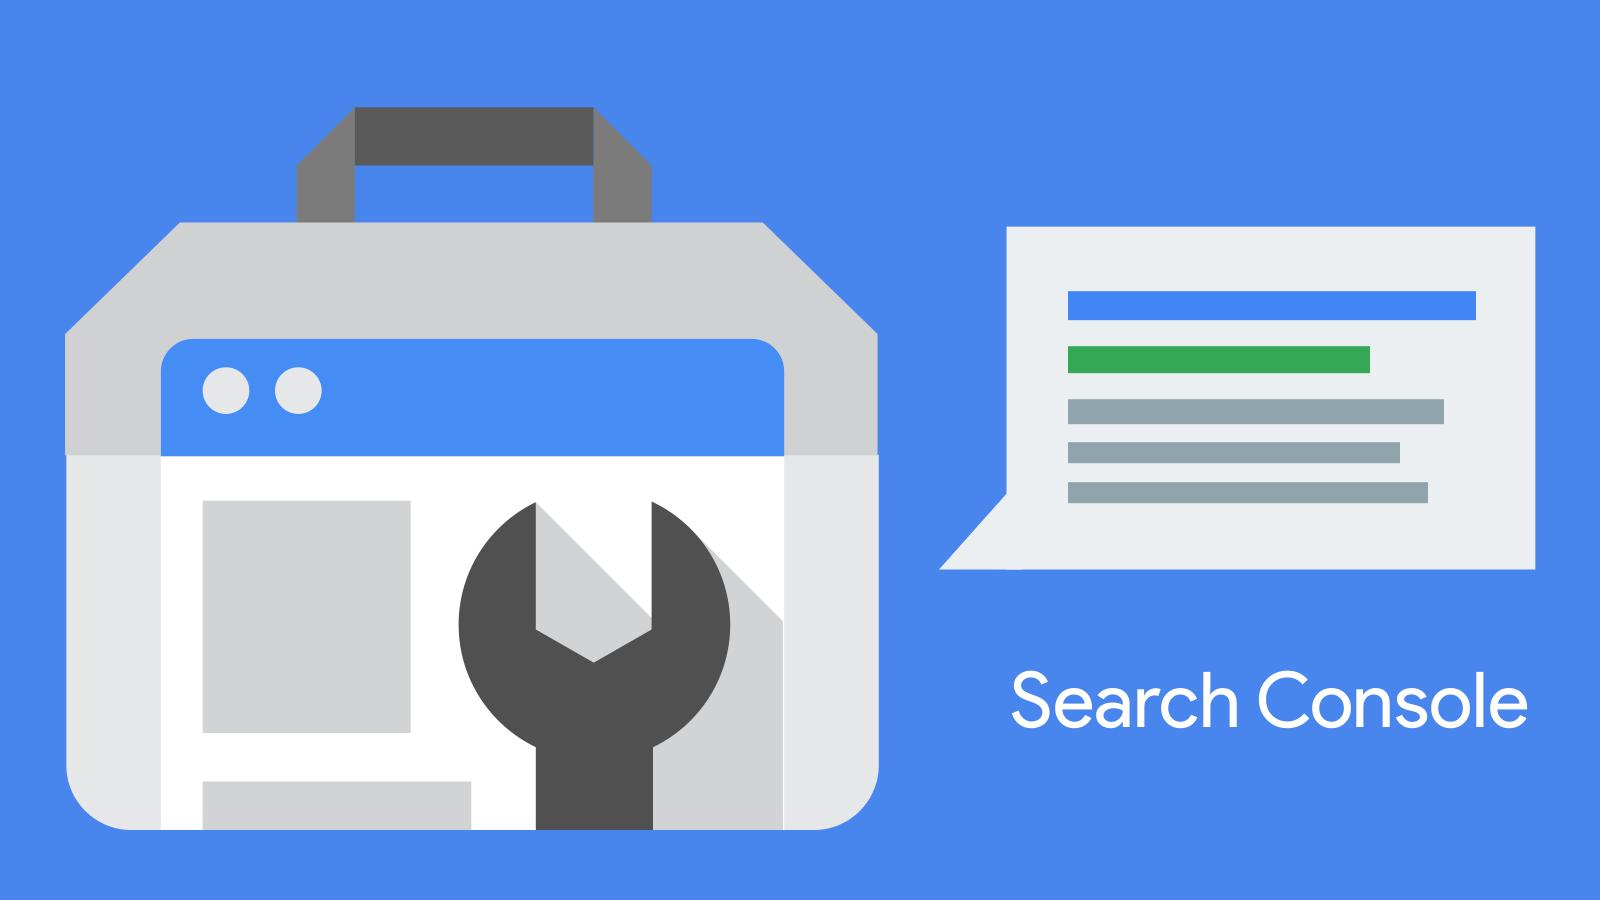 zmiany w Google Search Console